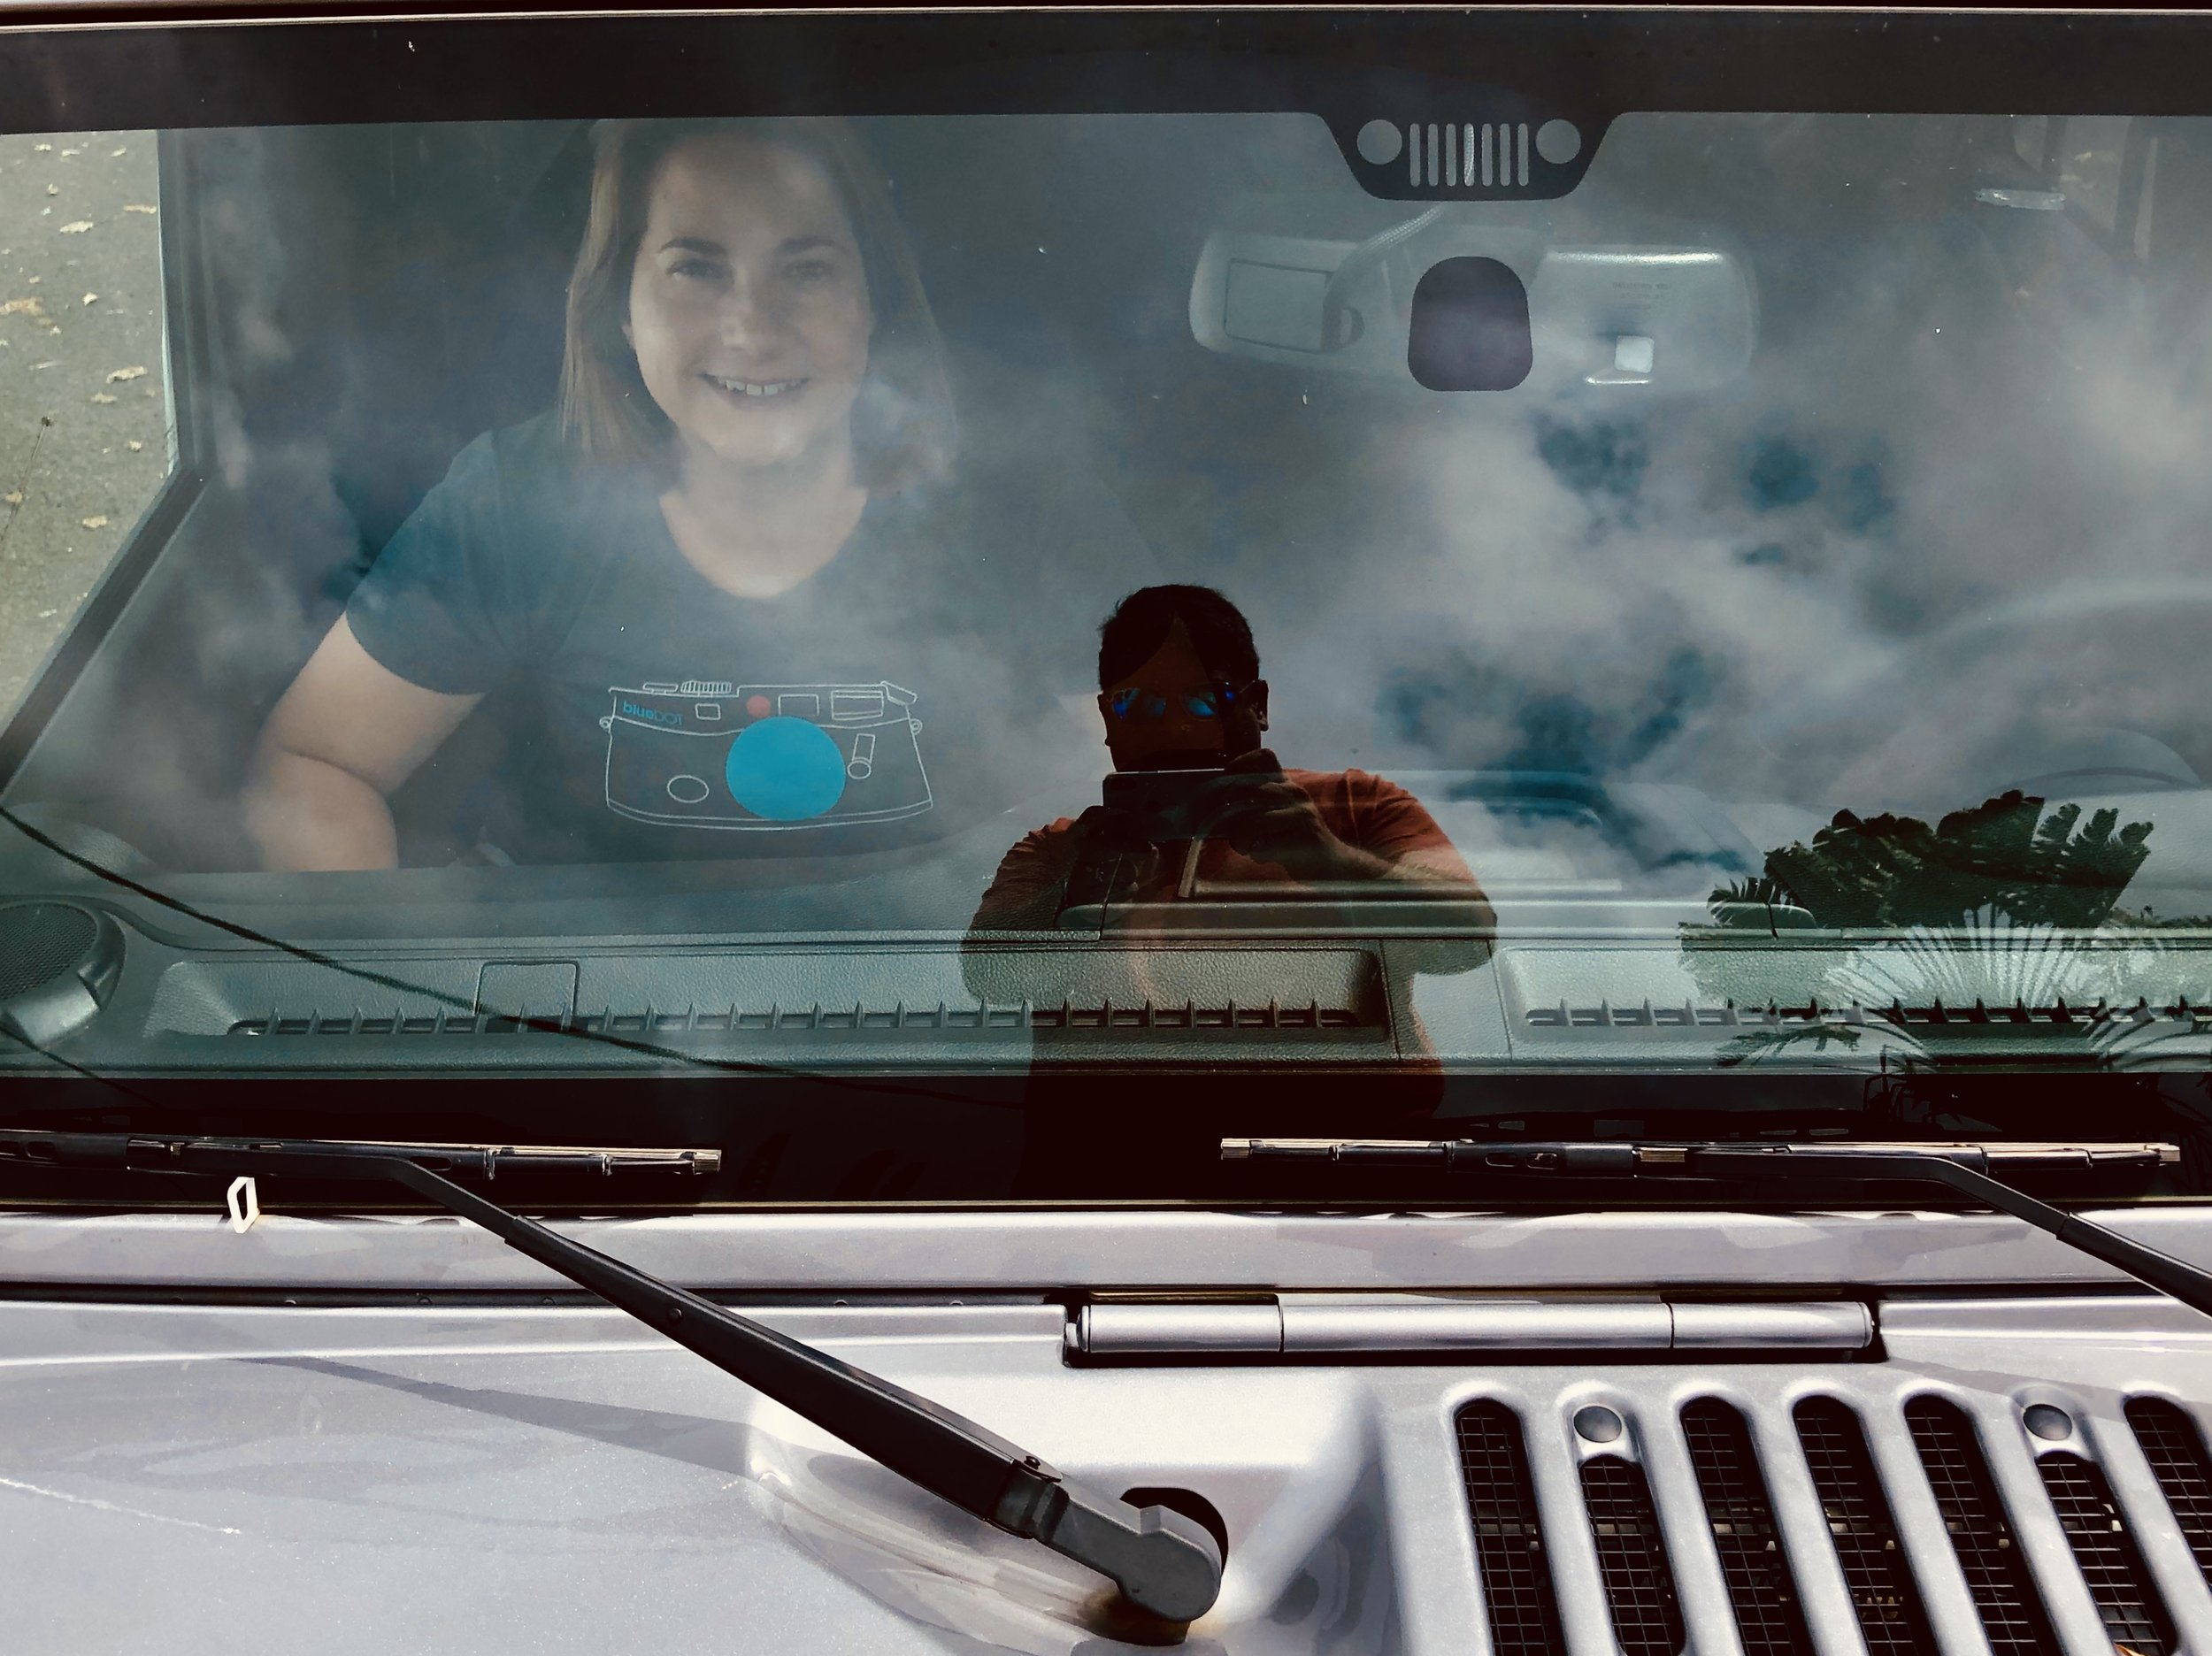 Red Dot Blue Dot Reflective Jeep Selfie